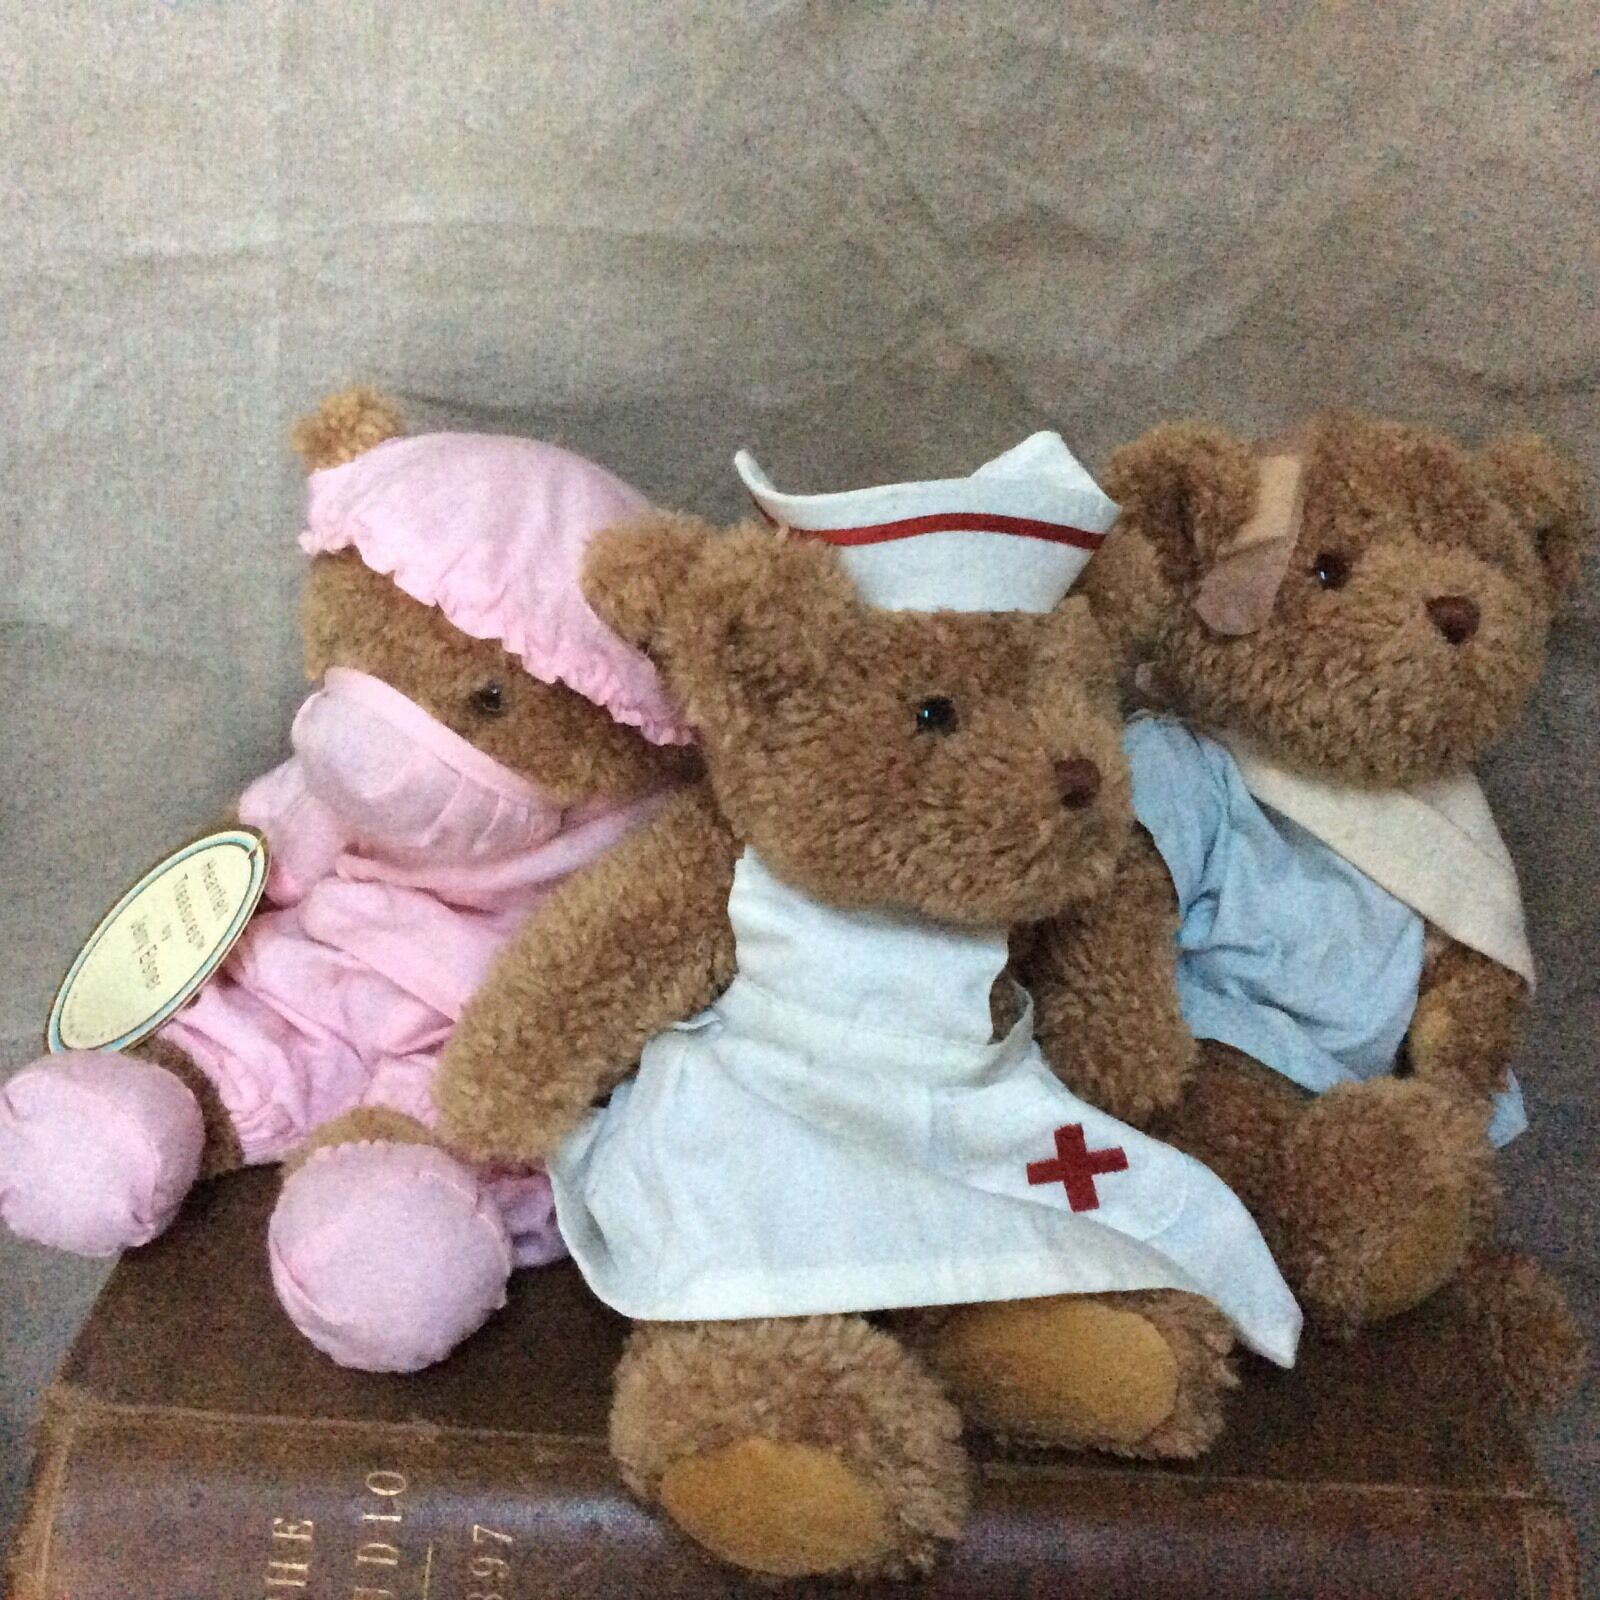 Teddy Bears Set NURSE PATIENT CANDIE Jerry Eisner HEARTFELT TREASURES 3pc Doctor